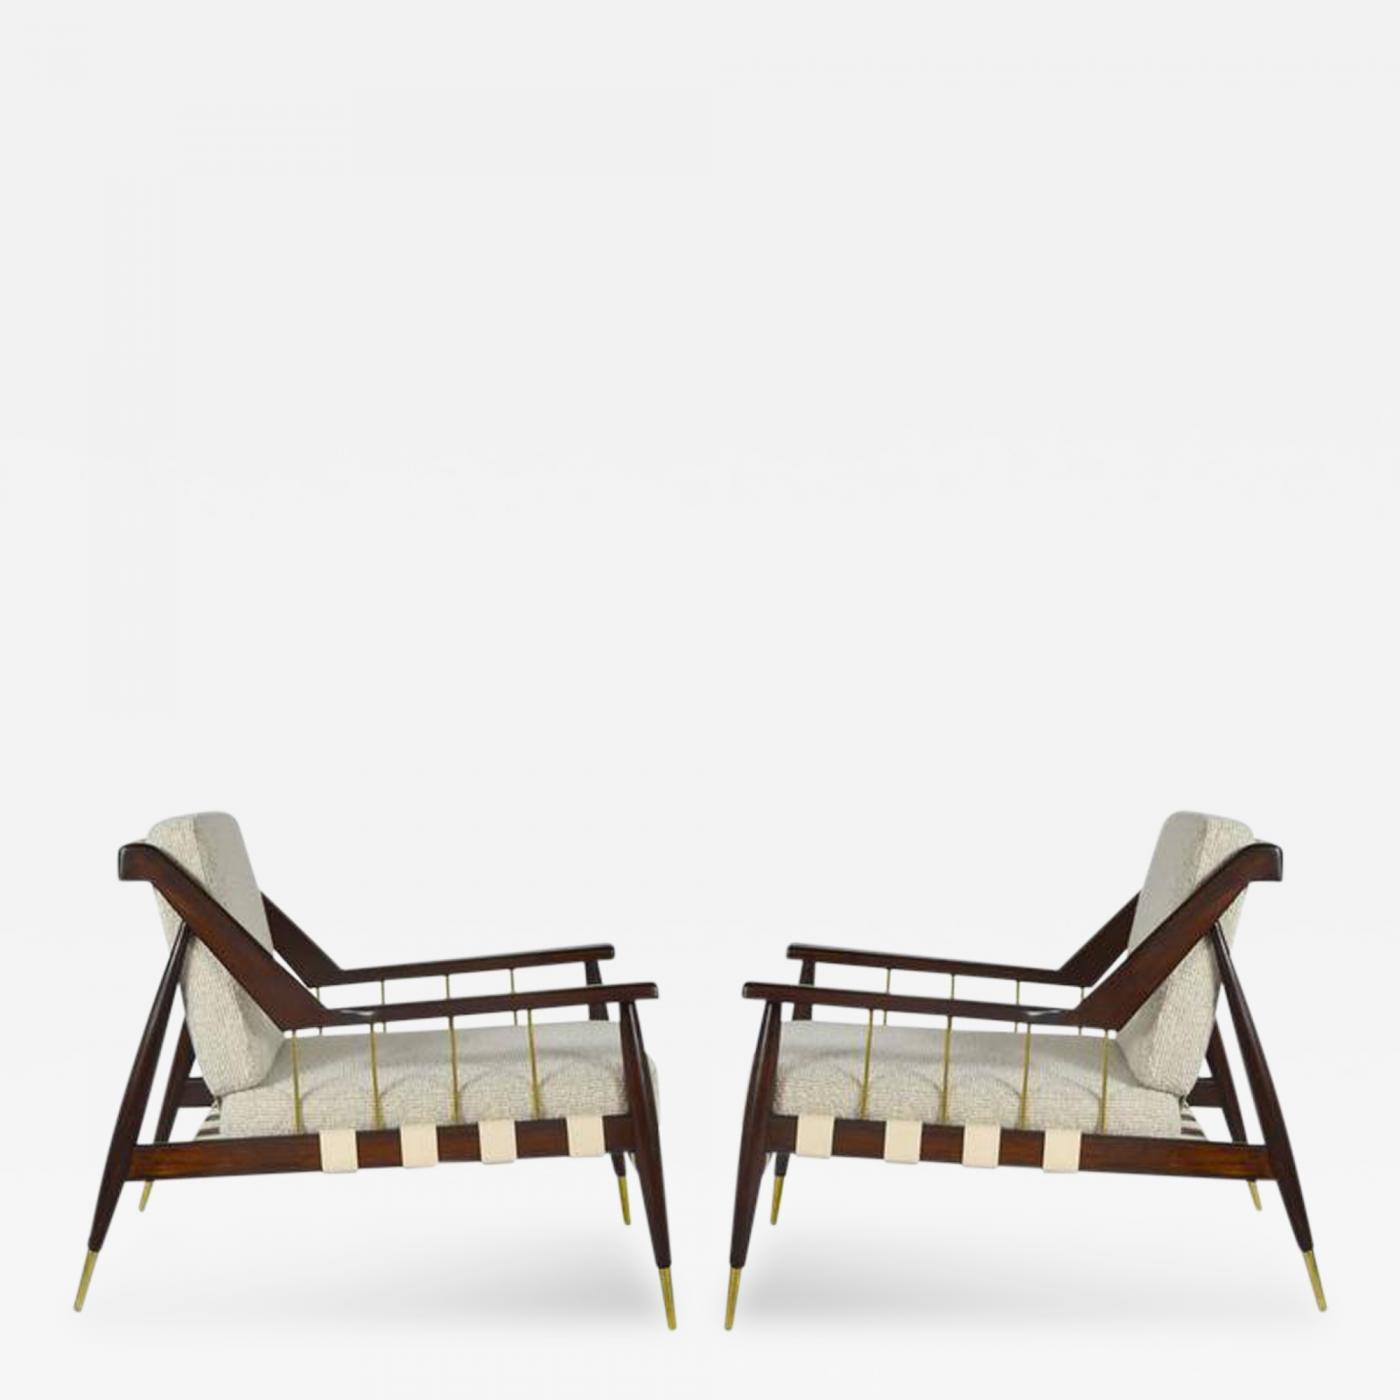 edmond spence rare edmond spence strapped lounge chairs